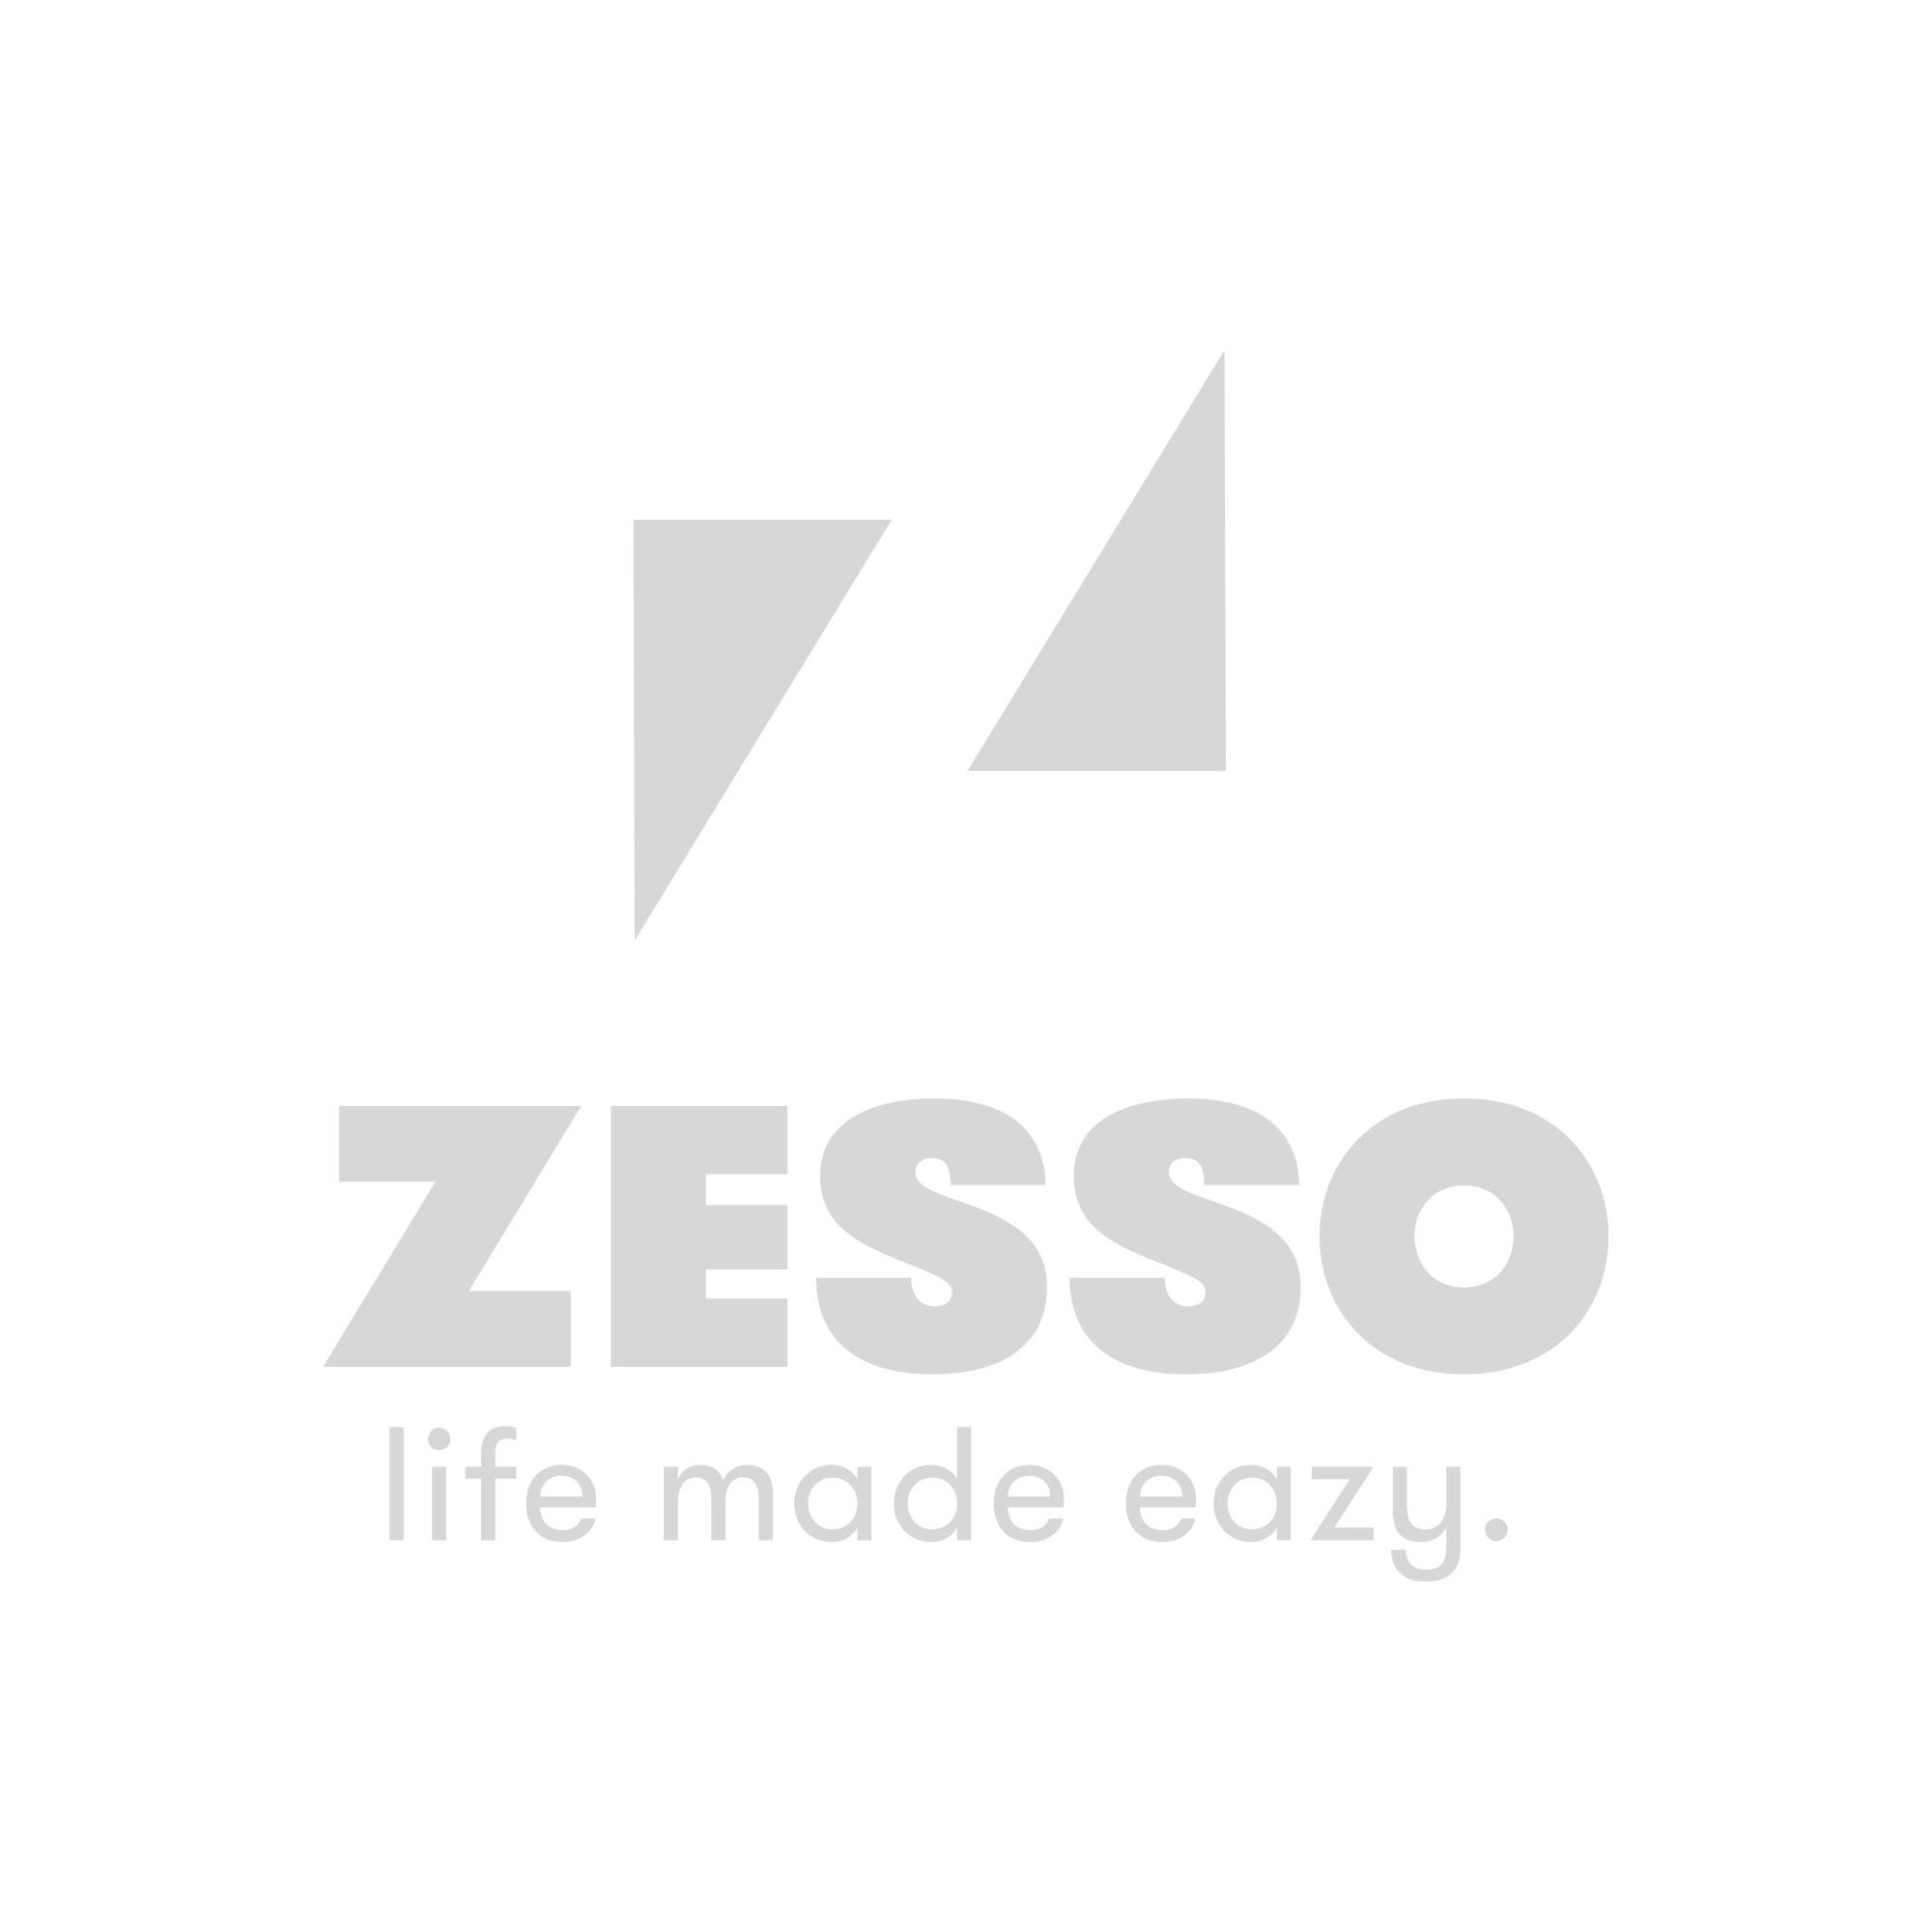 Sophie La Girafe Babypyjama Boy 3 Maanden Blauw